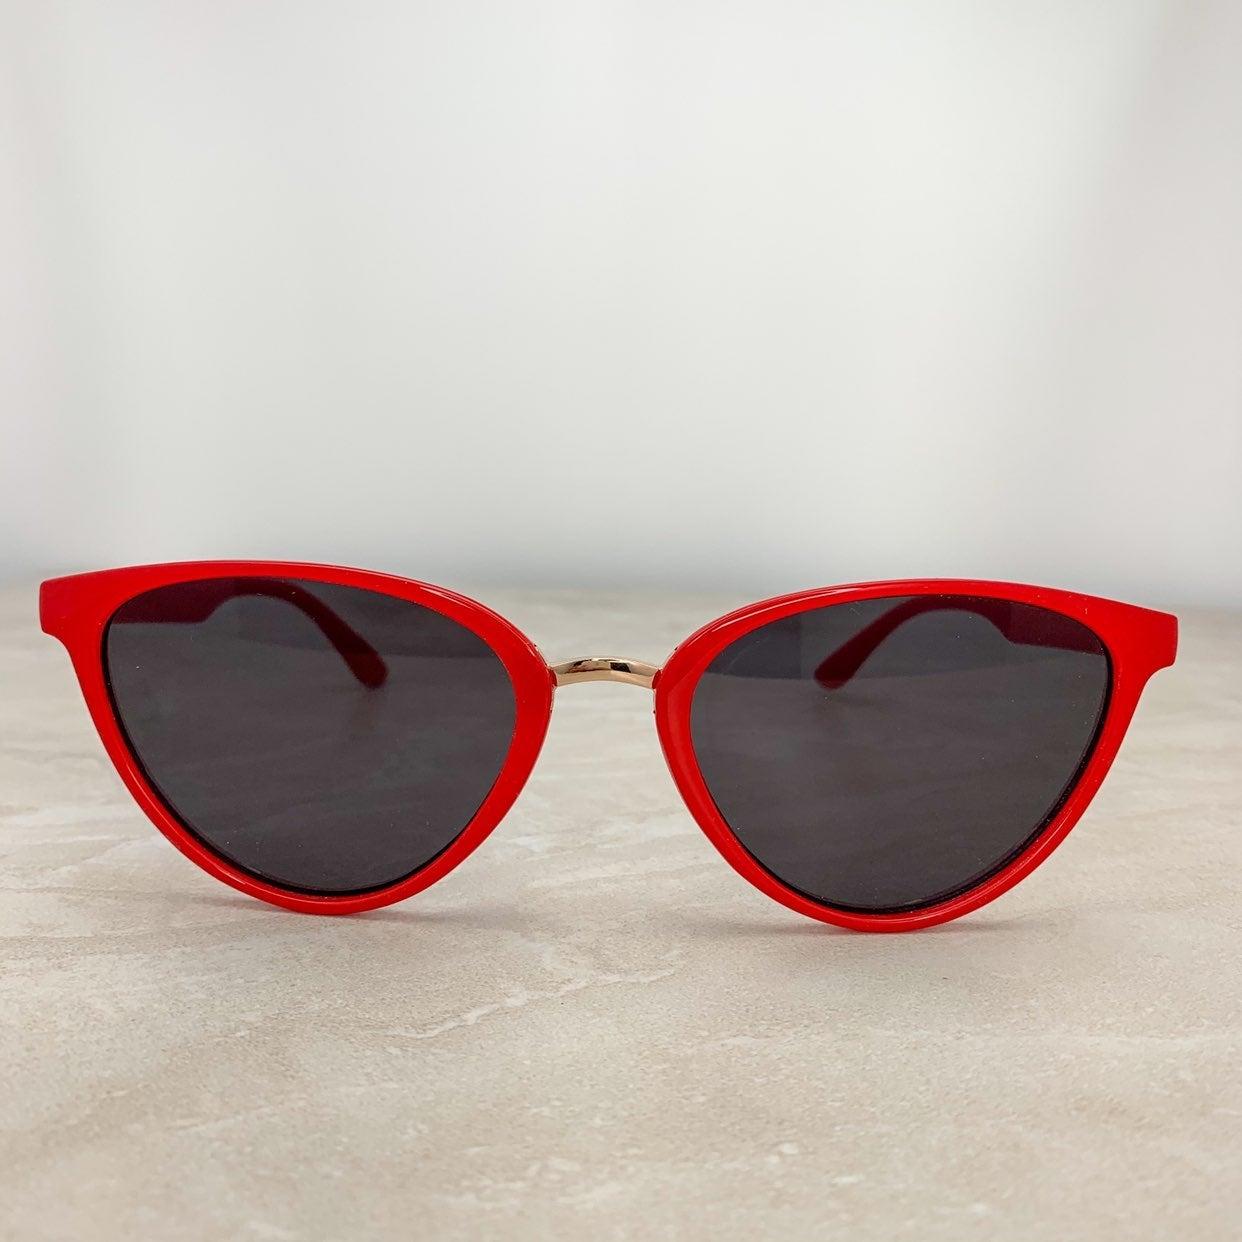 cute red cat eye sunglasses for women